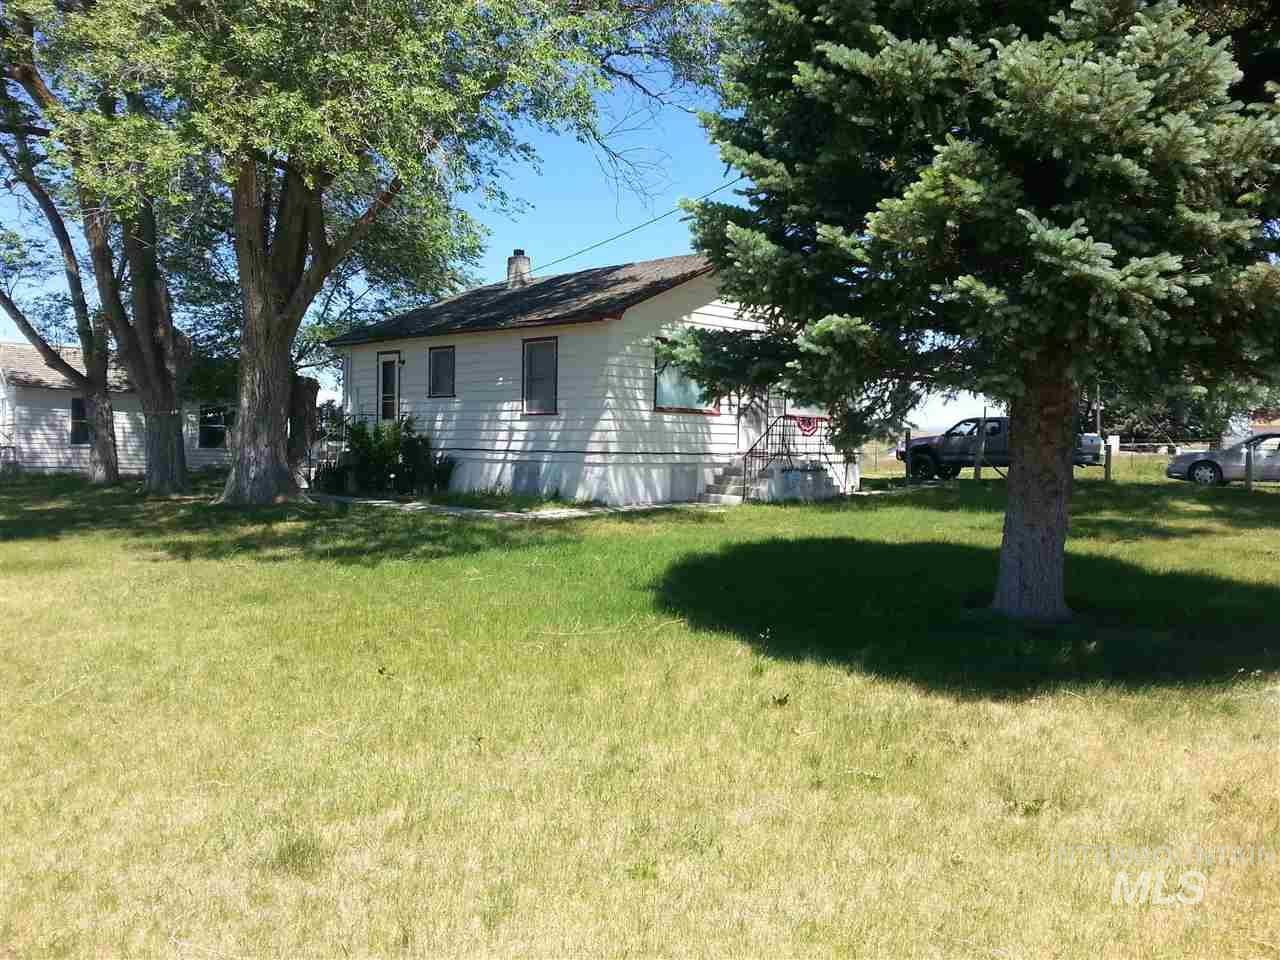 Single Family Home for Sale at 409 N Hi Way 75 409 N Hi Way 75 Shoshone, Idaho 83352